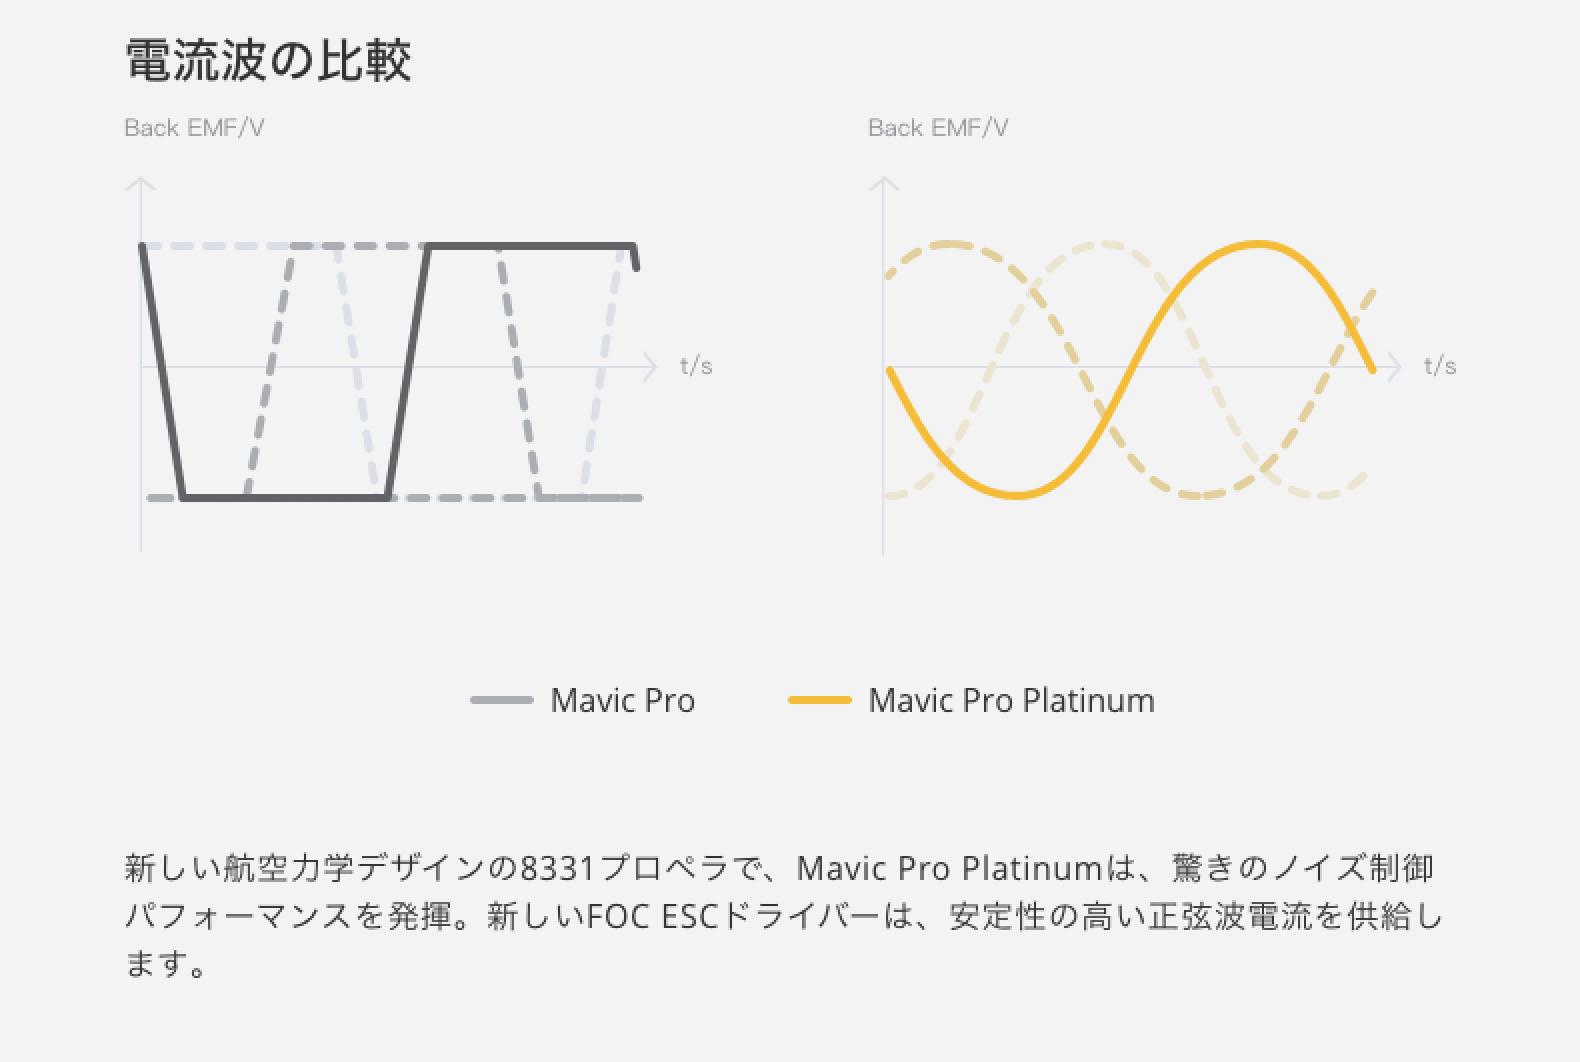 MAVIC PRO PLATINUM登場!従来と価格差15000円悩むならPhantom4advanceがおすすめ!